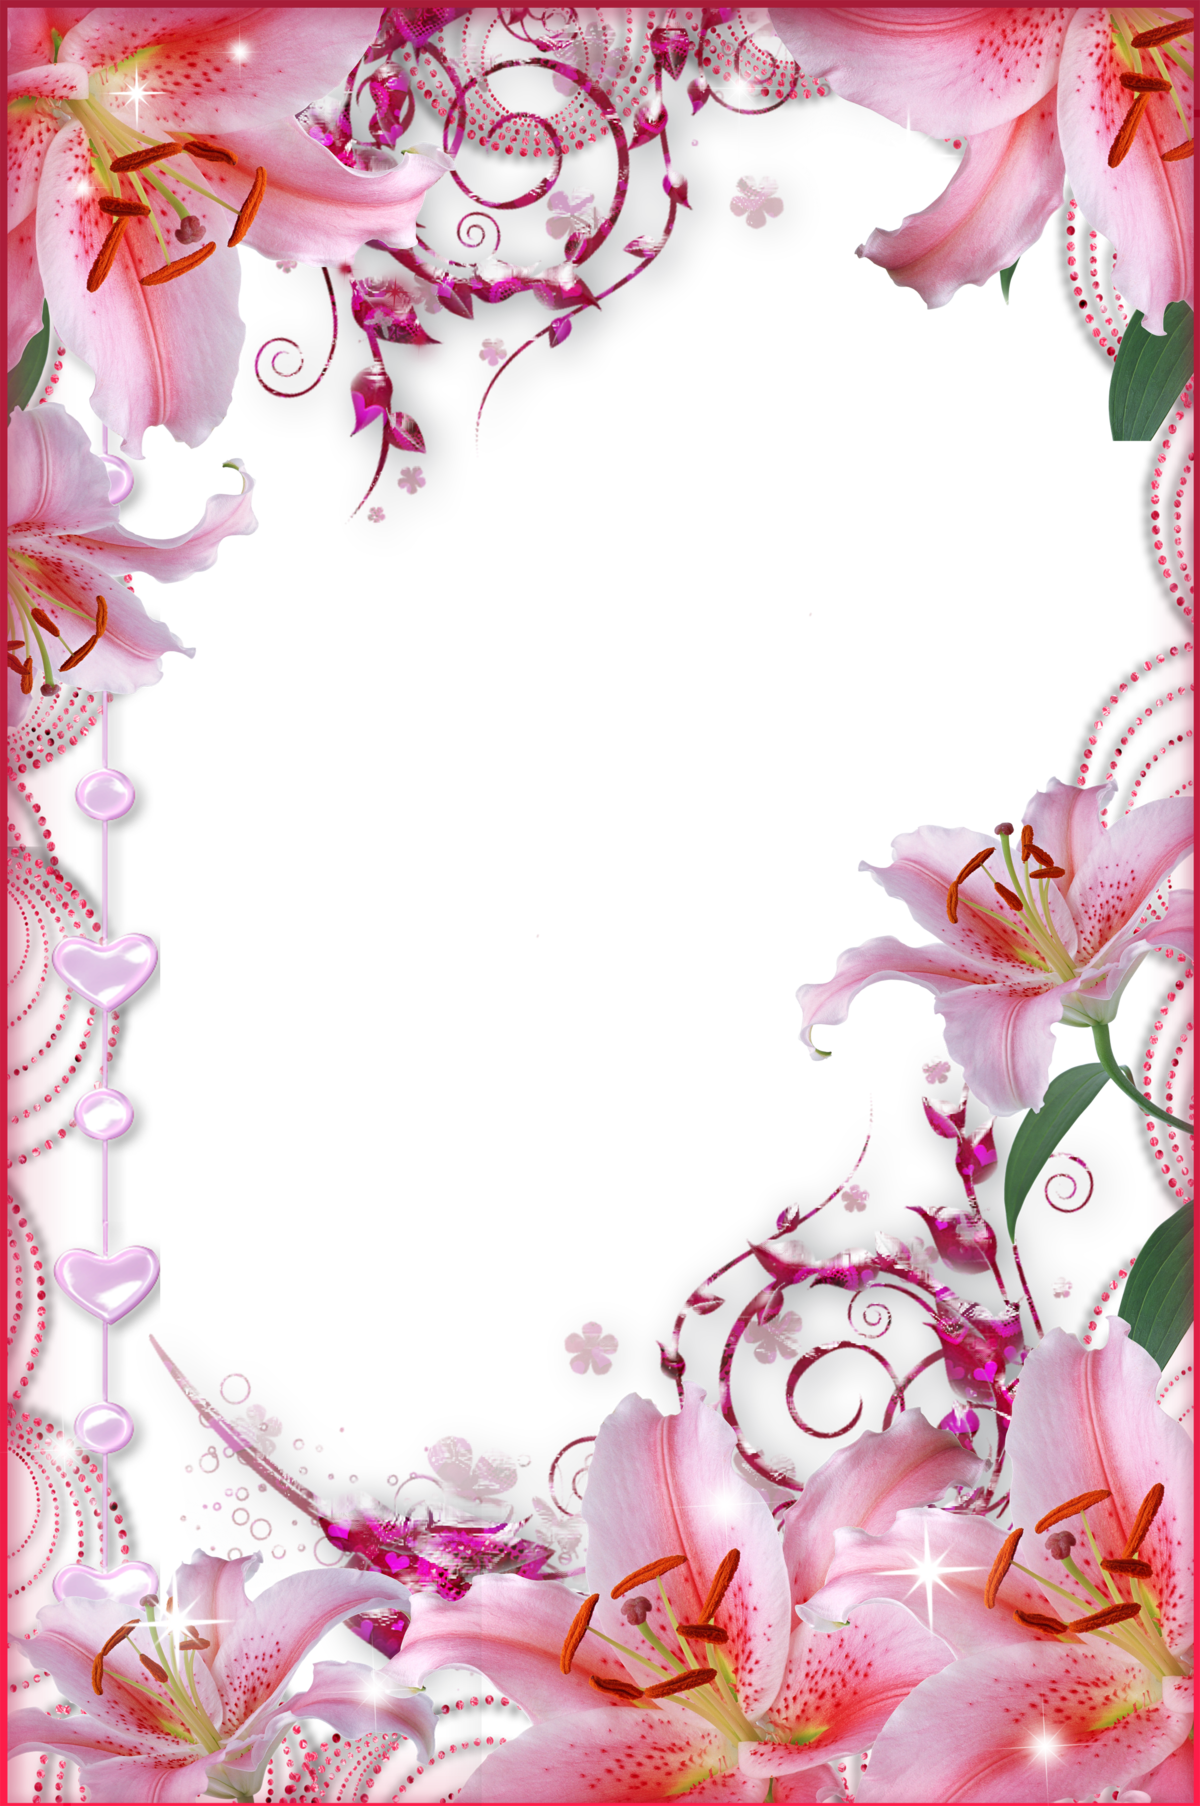 Рамки и открытки из фотошопа, конфет